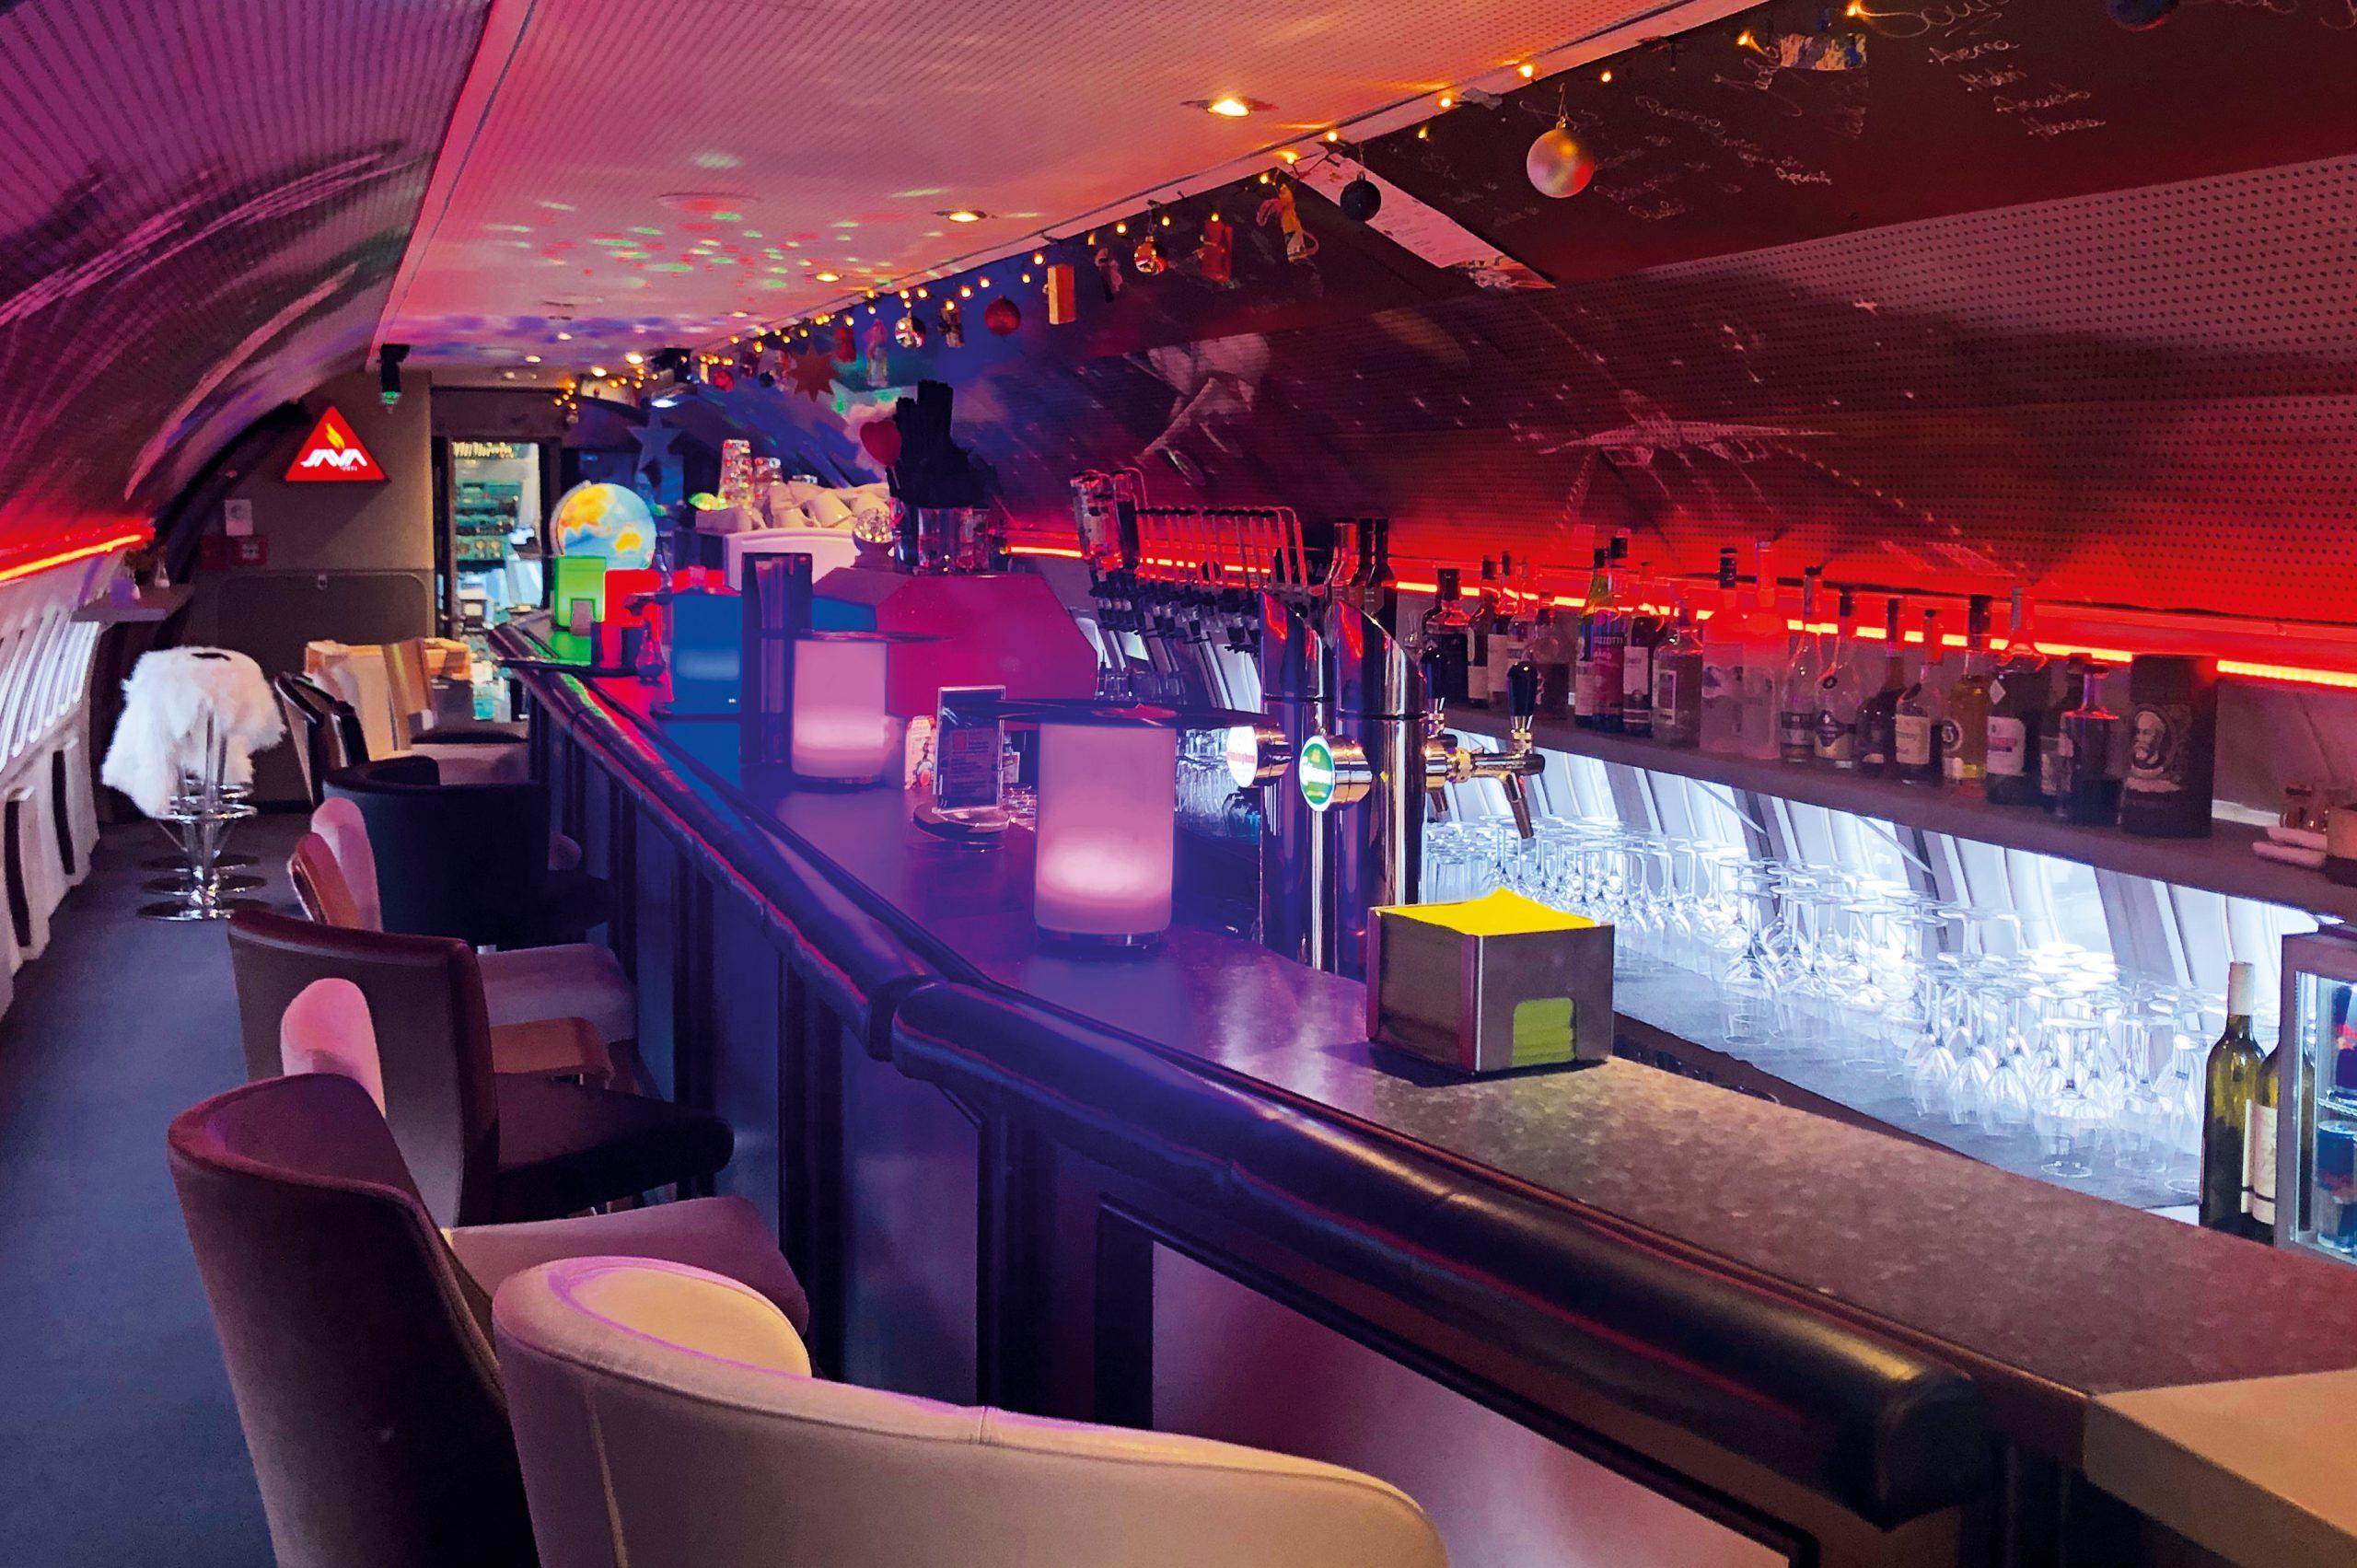 _0008s_0006_d_a_80s Flieger Bar & Restaurant_Foto NOVAPARK_ID098